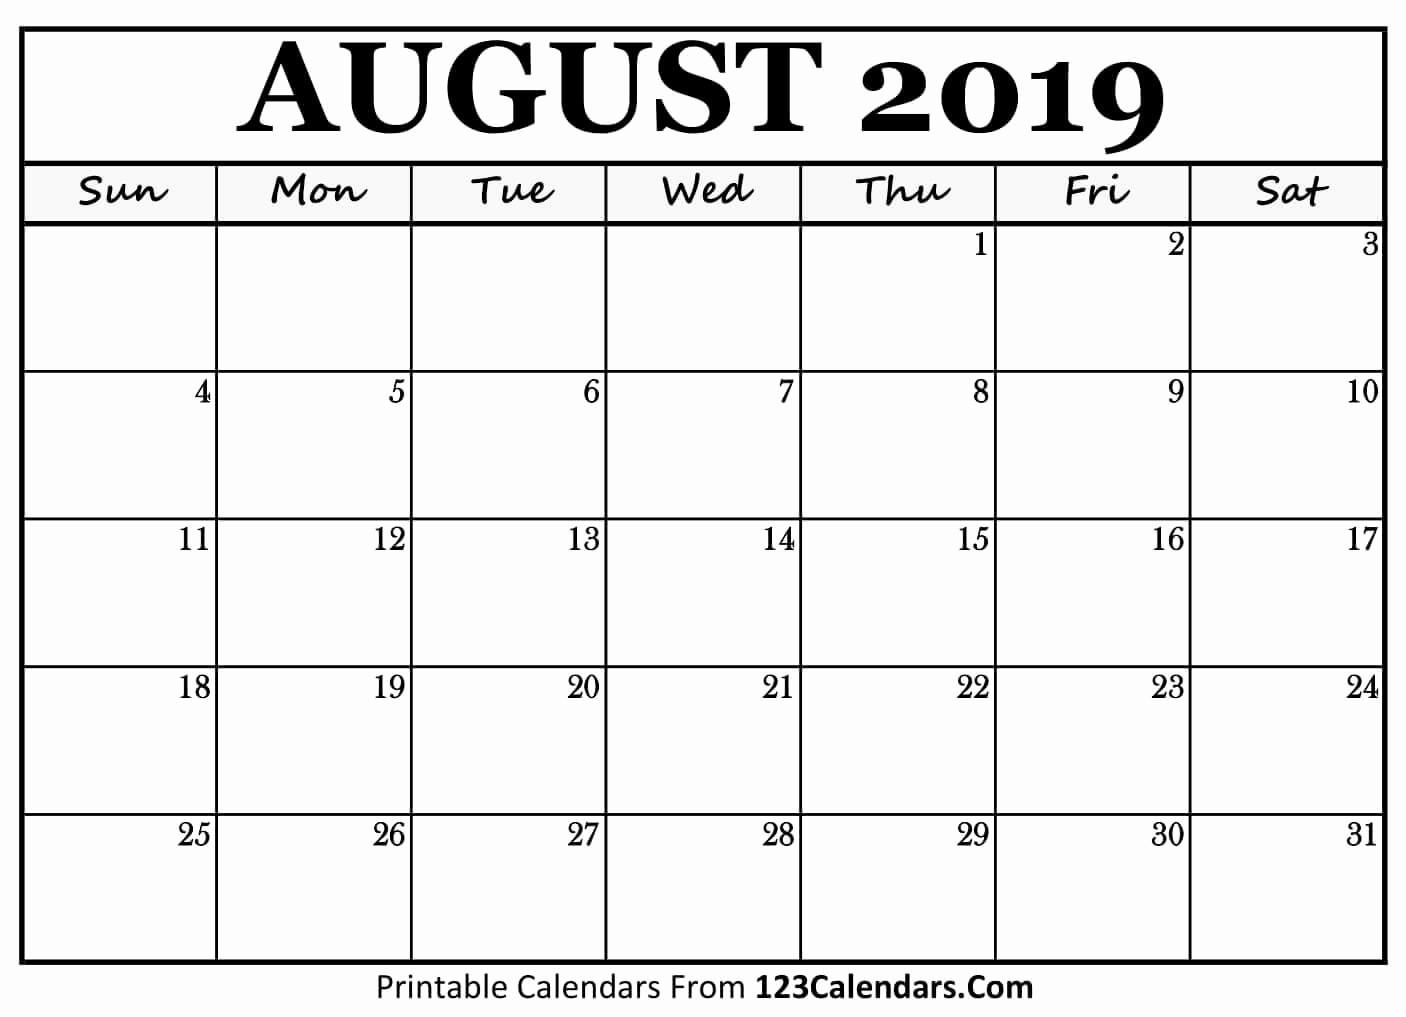 August 2019 Calendar Spanish | Calendar Template